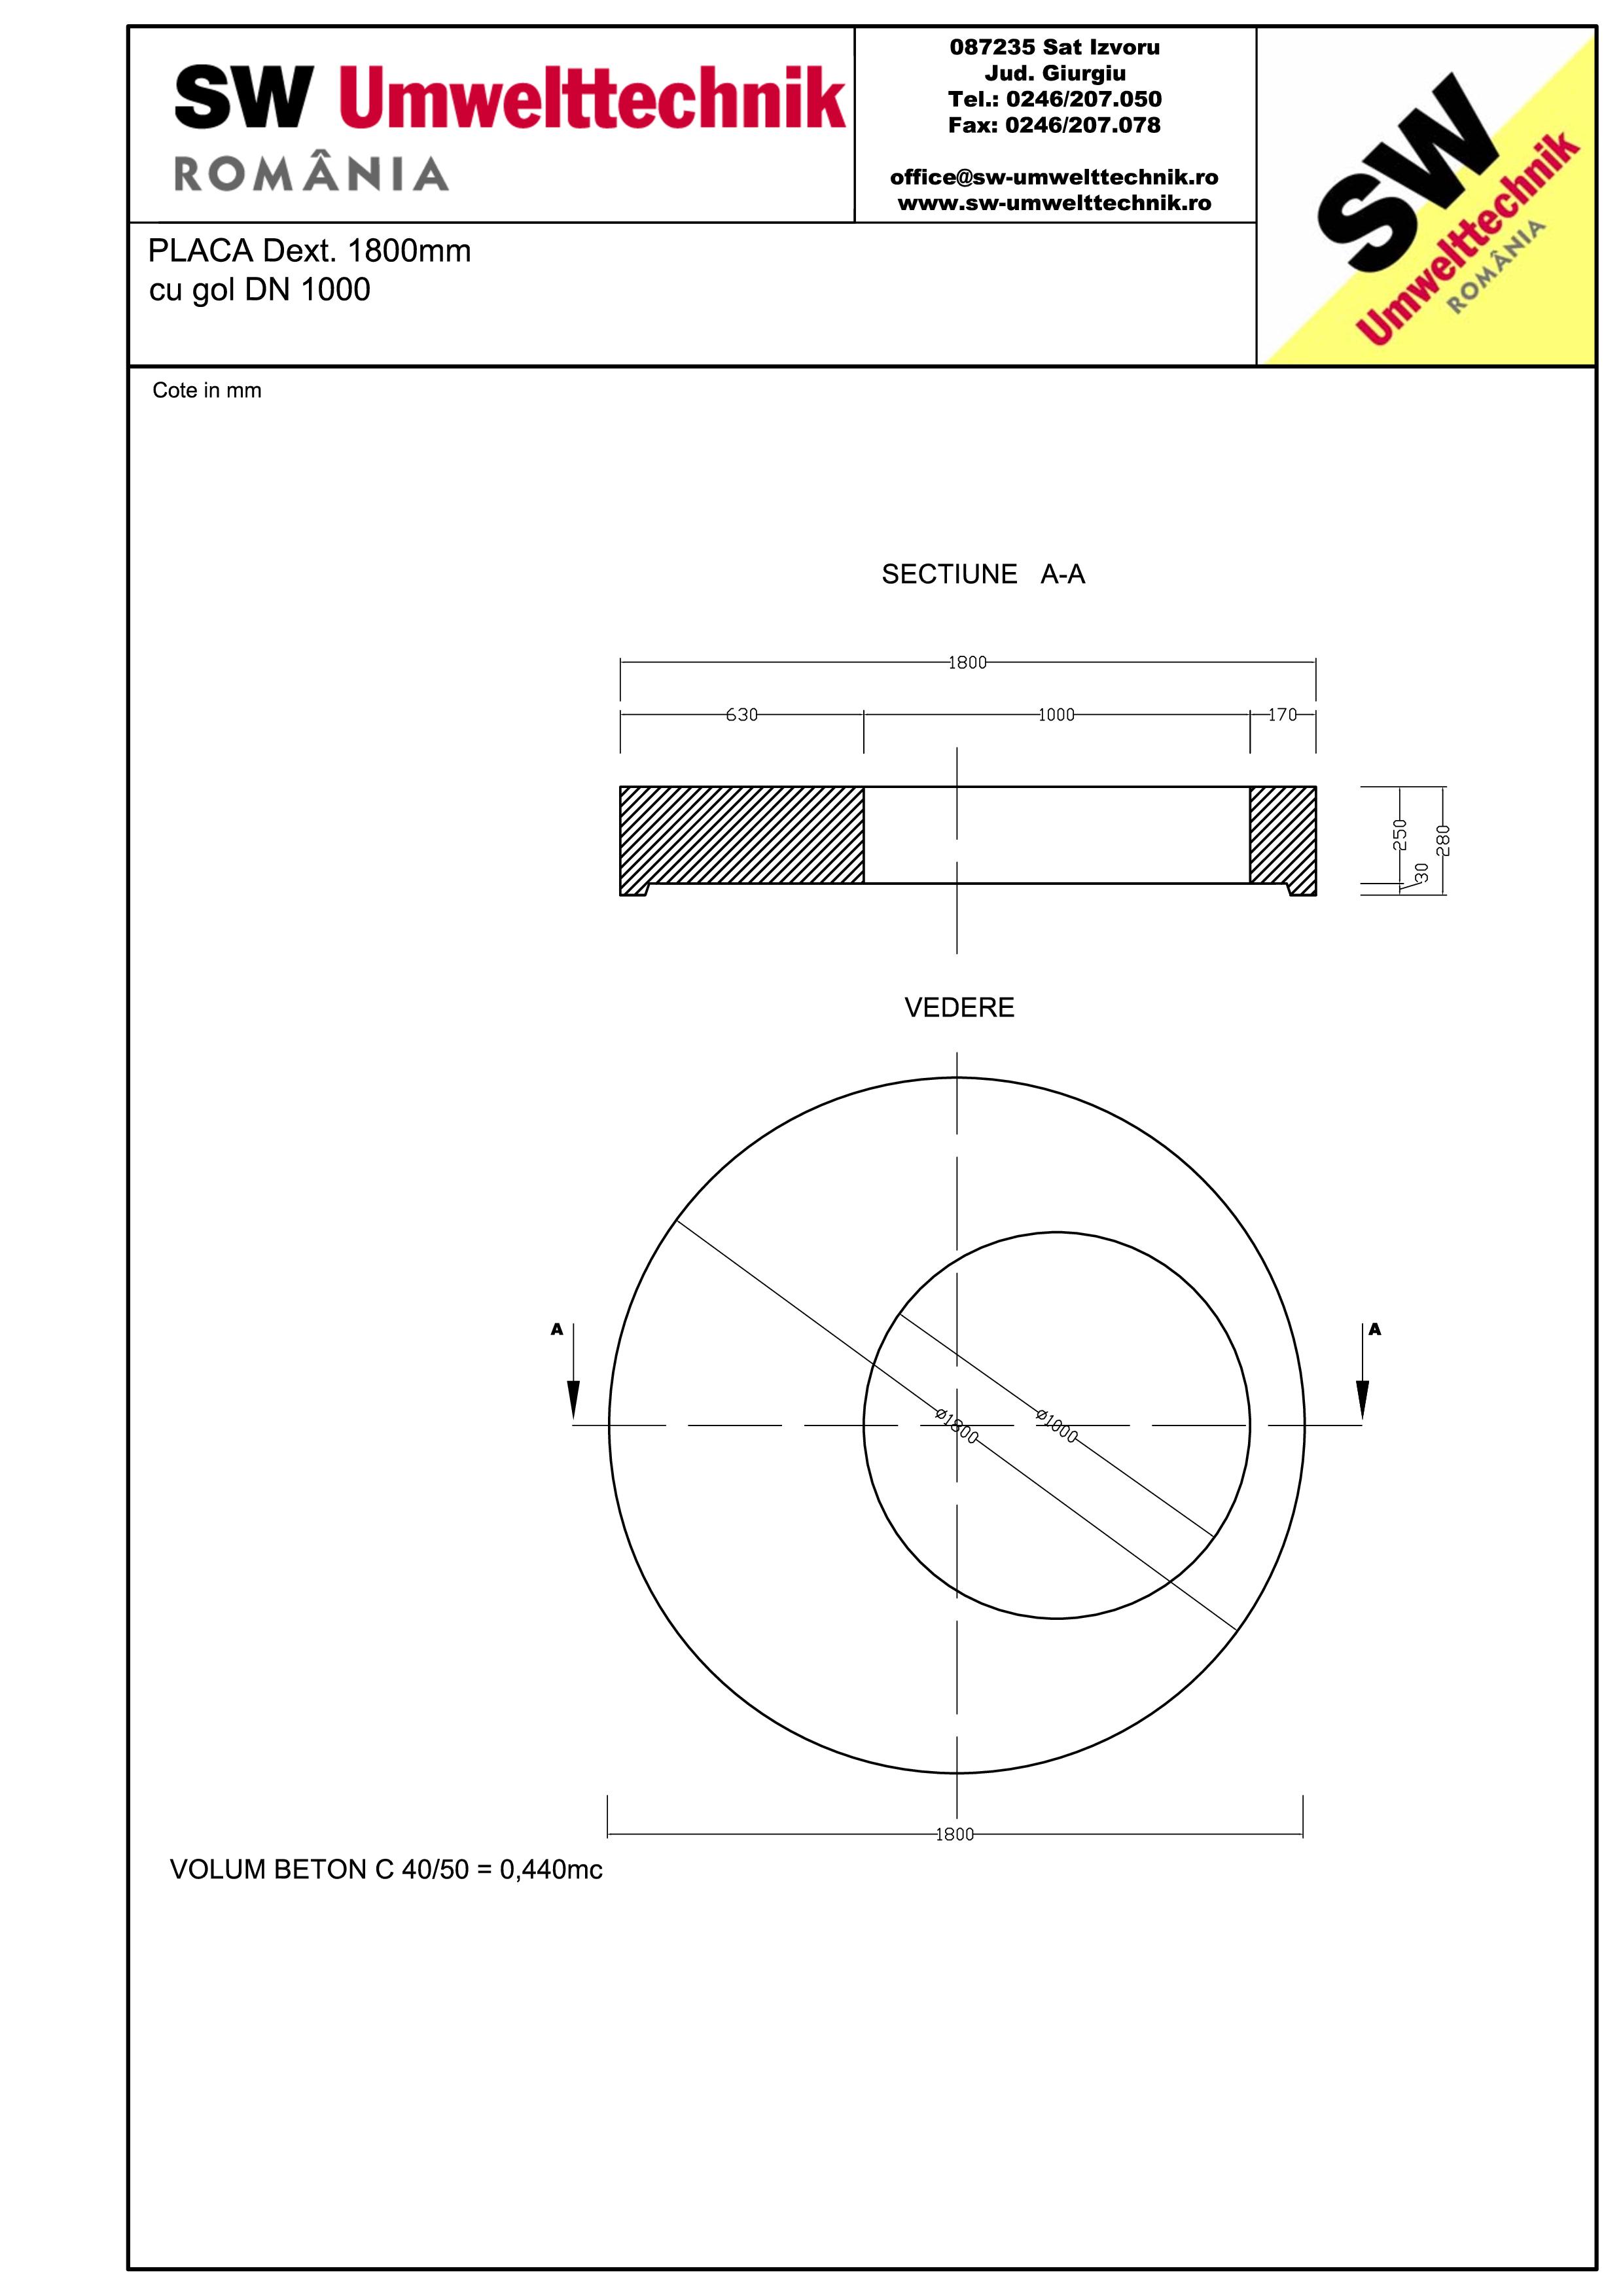 Pagina 1 - CAD-PDF Placa Dext.1800 H250 cu gol DN1000 SW UMWELTTECHNIK Detaliu de produs